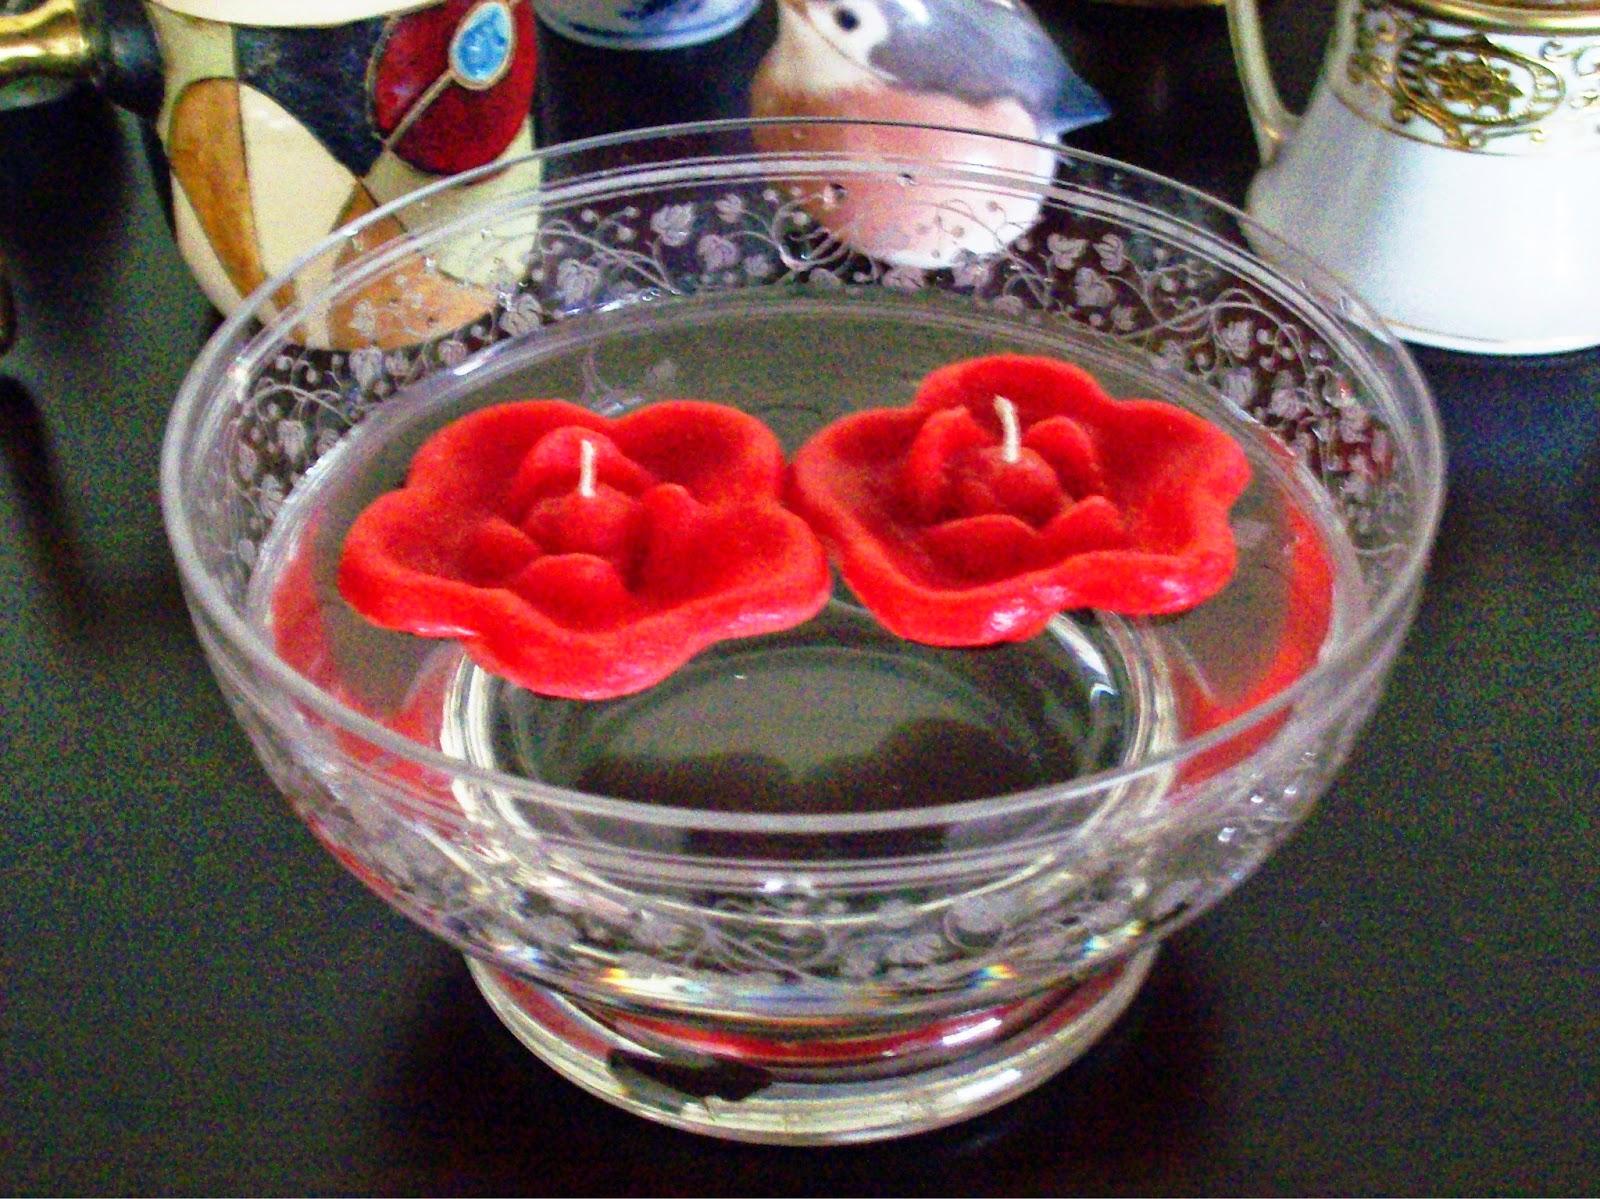 Velas casiopea decorar con velas flotantes - Velas de agua ...